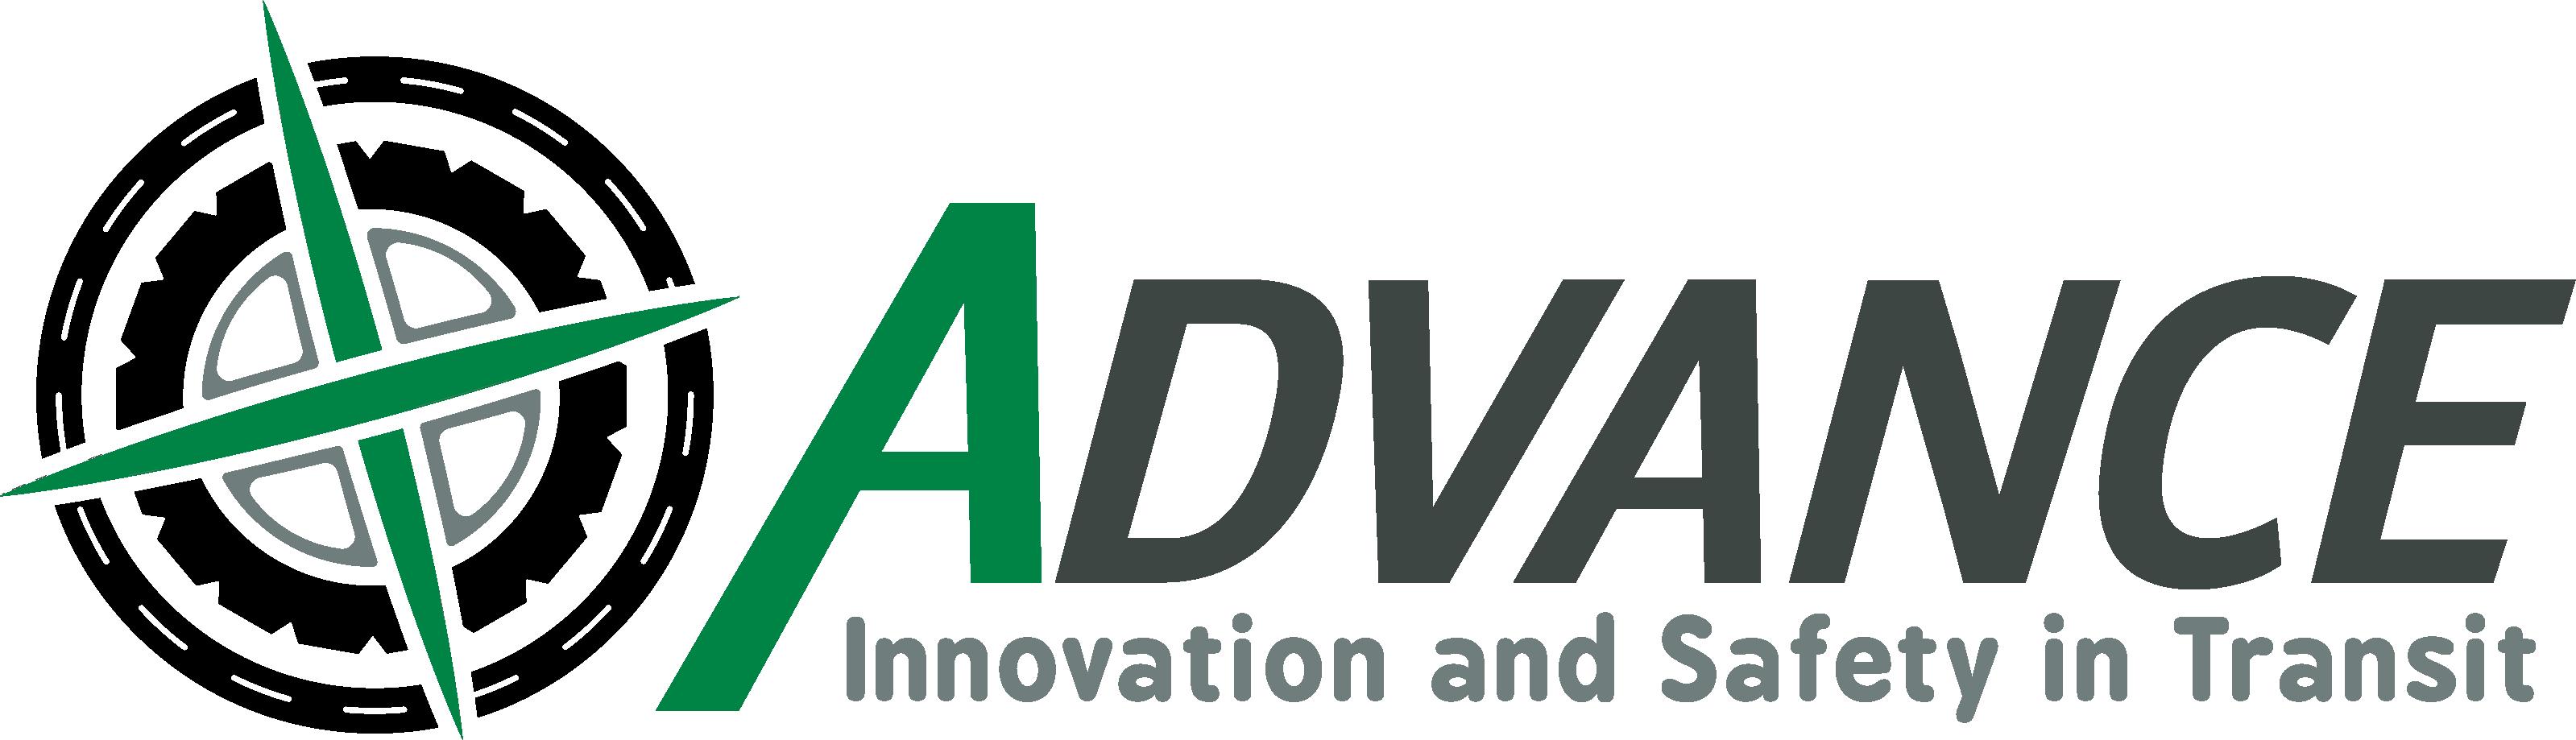 Advance: Innovation and Safety in Transit logo